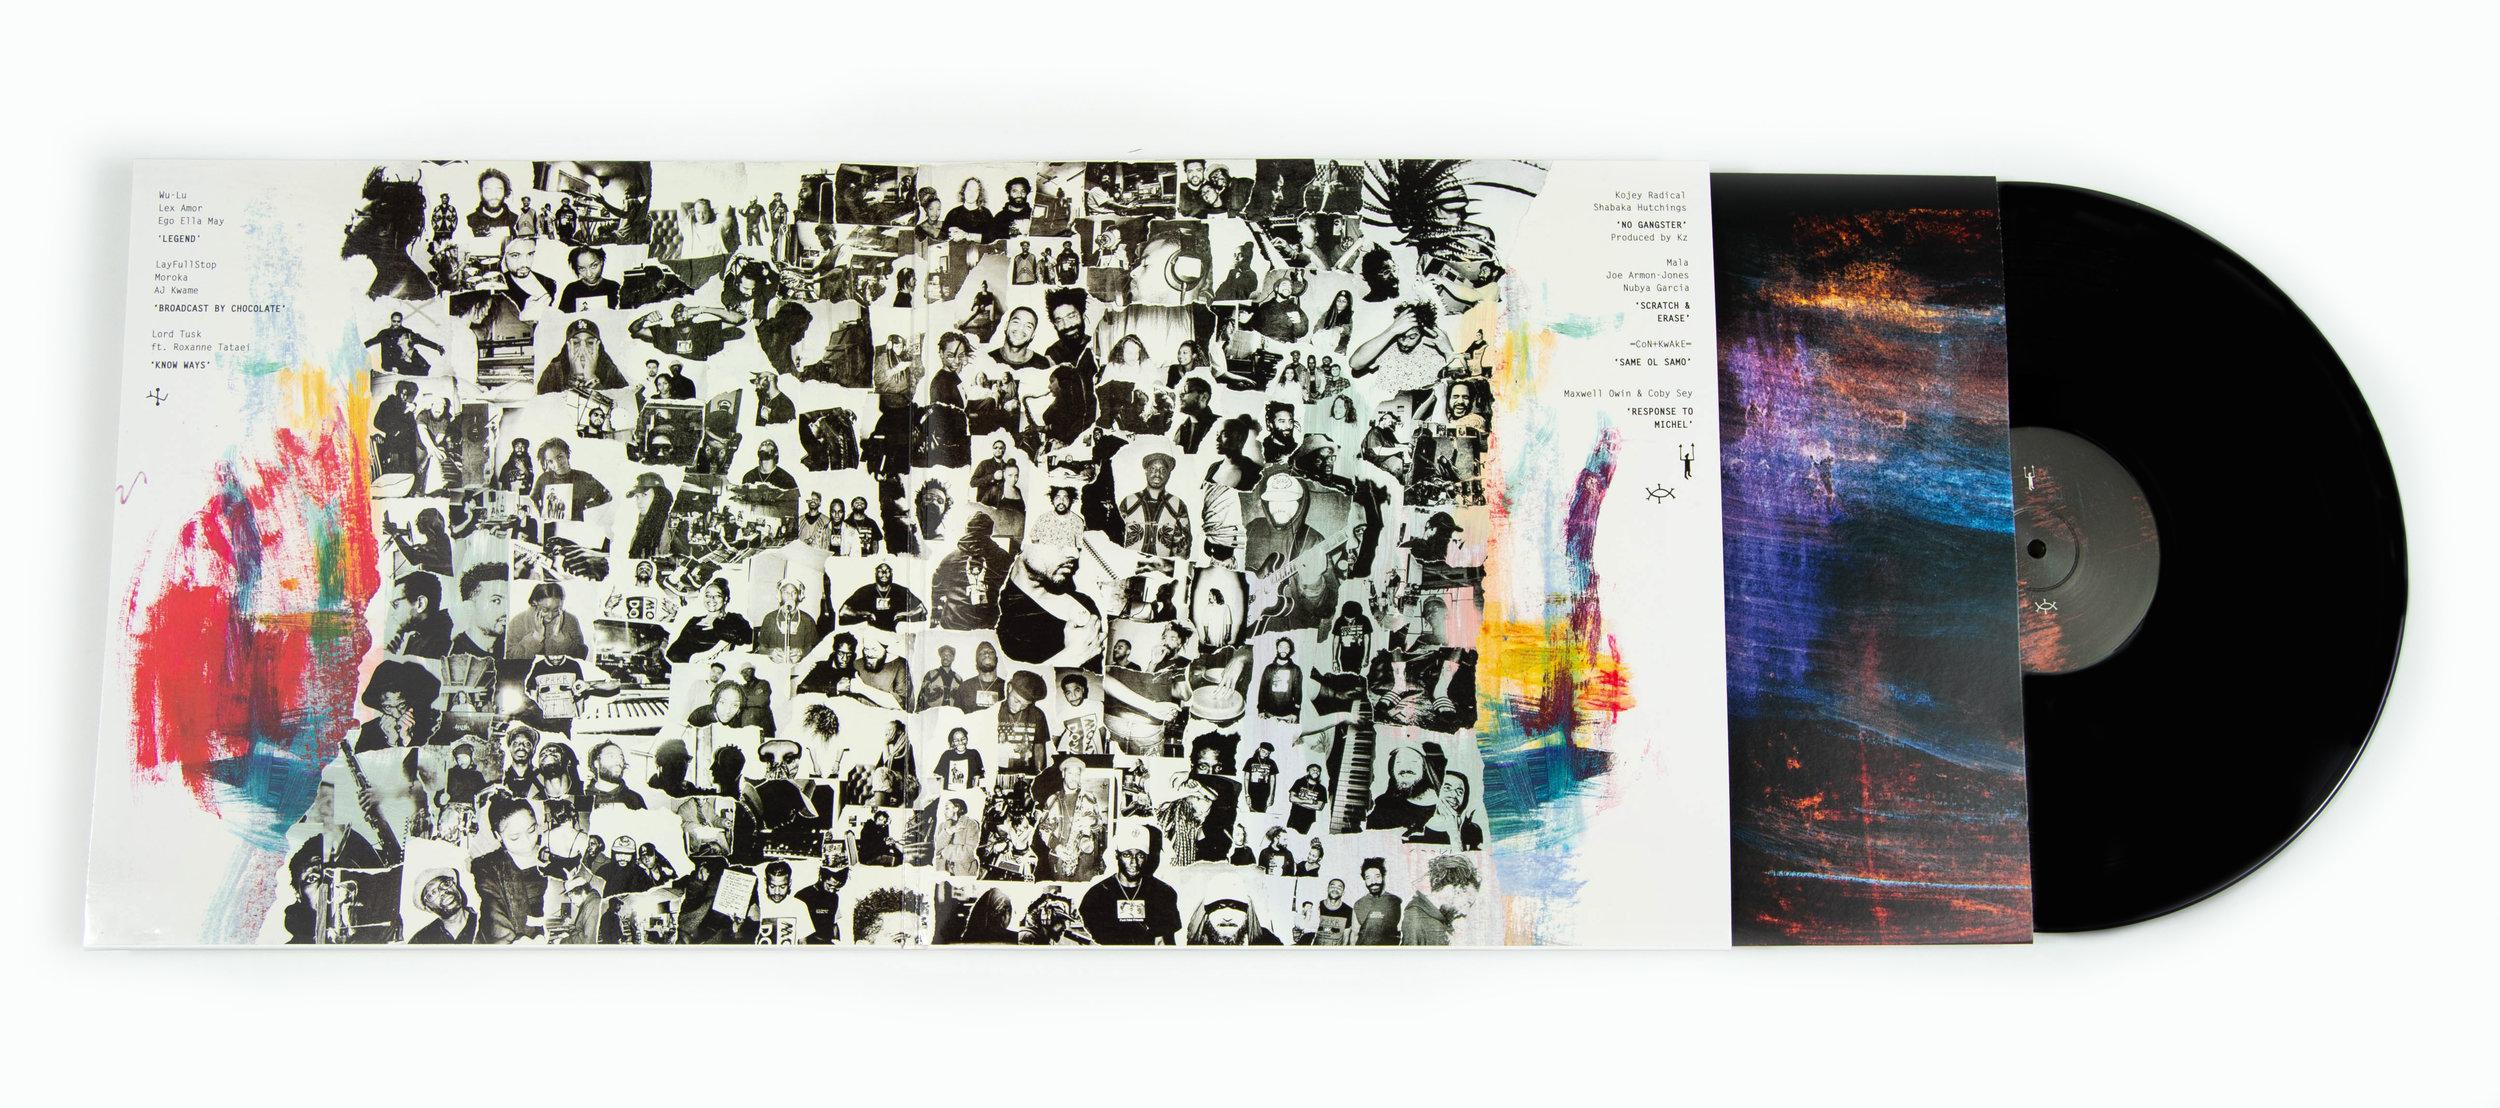 Artwork by Fabrice Bourgelle and Anja Ngozi / Design by Raimund Wong.